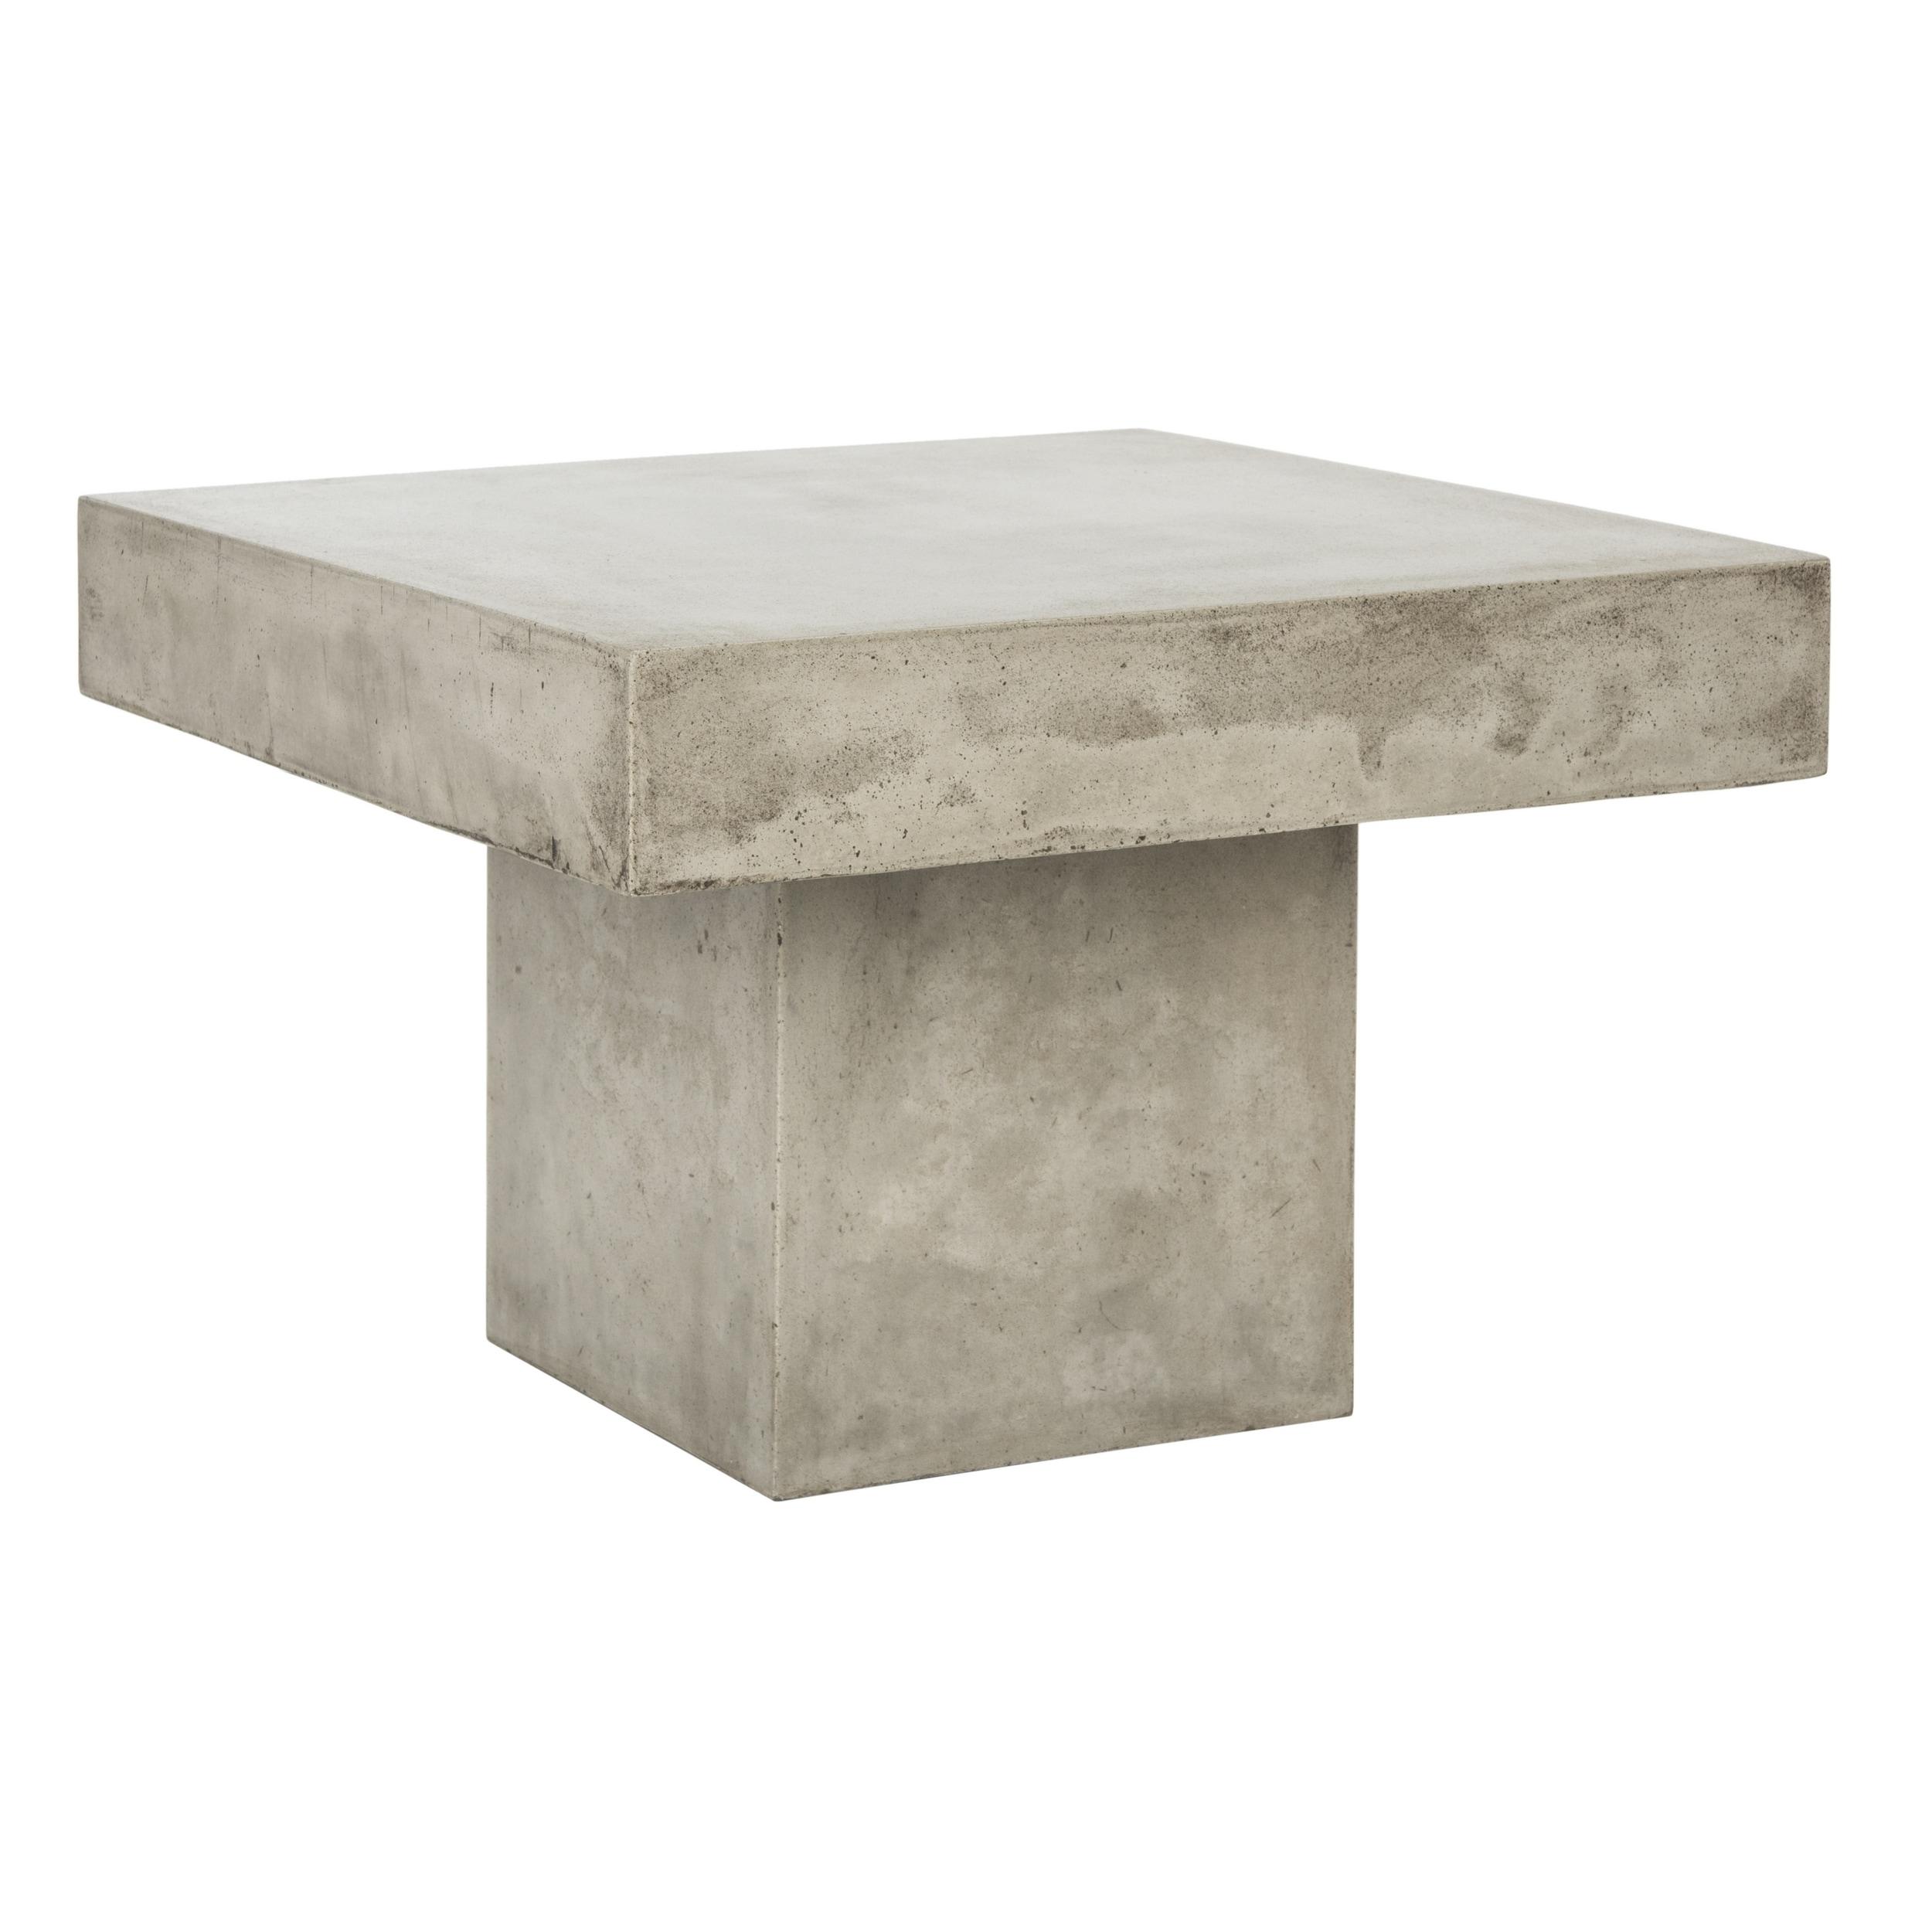 Safavieh Tallen Dark Grey Modern Concrete Indoor Outdoor Coffee Table 23 6 X 15 8